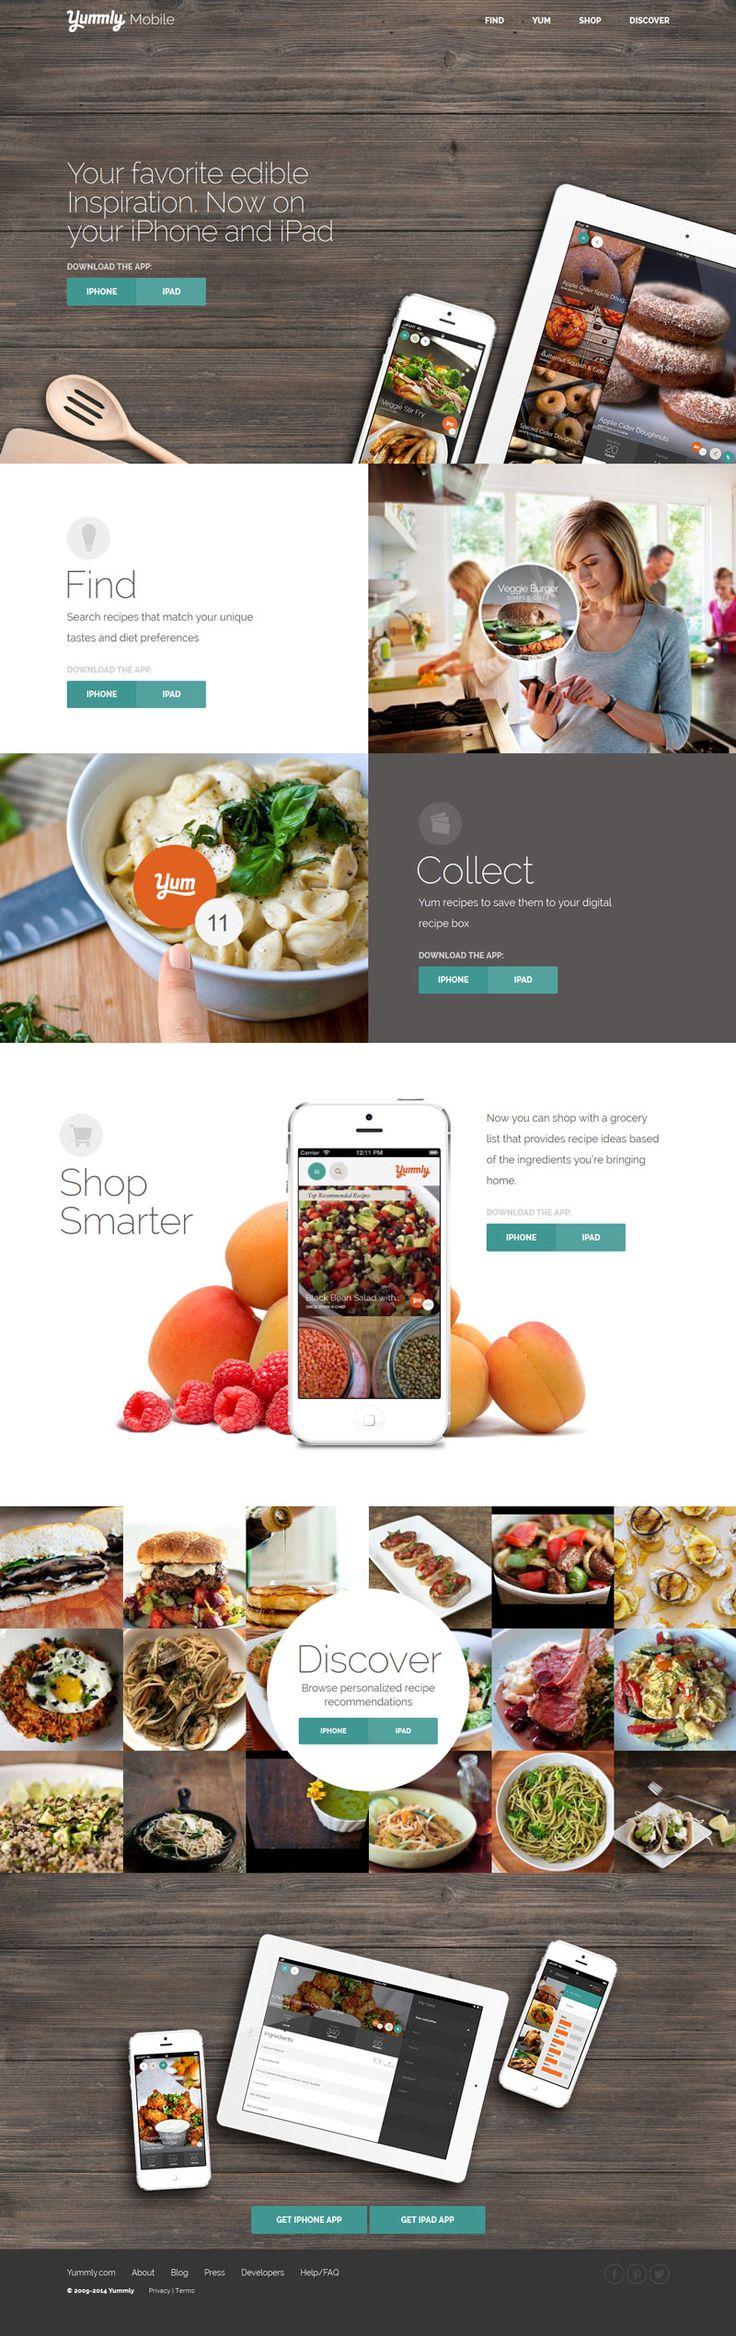 Yumml Mobile, flat design website, wood